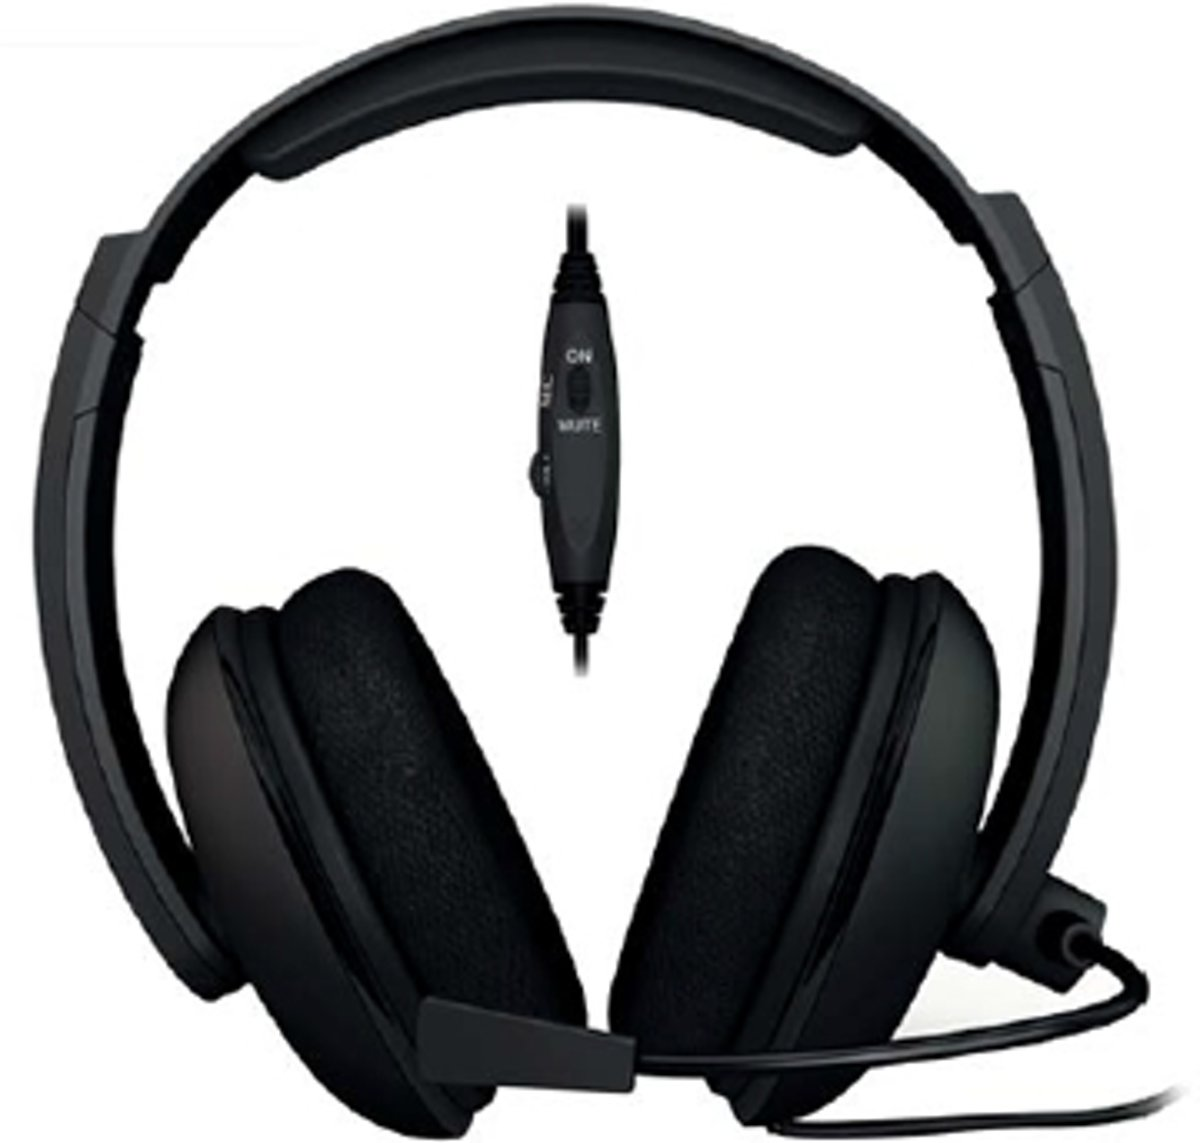 Turtle Beach Ear Force Z11 Wired Stereo Gaming Headset - Zwart (PC + Mac) kopen